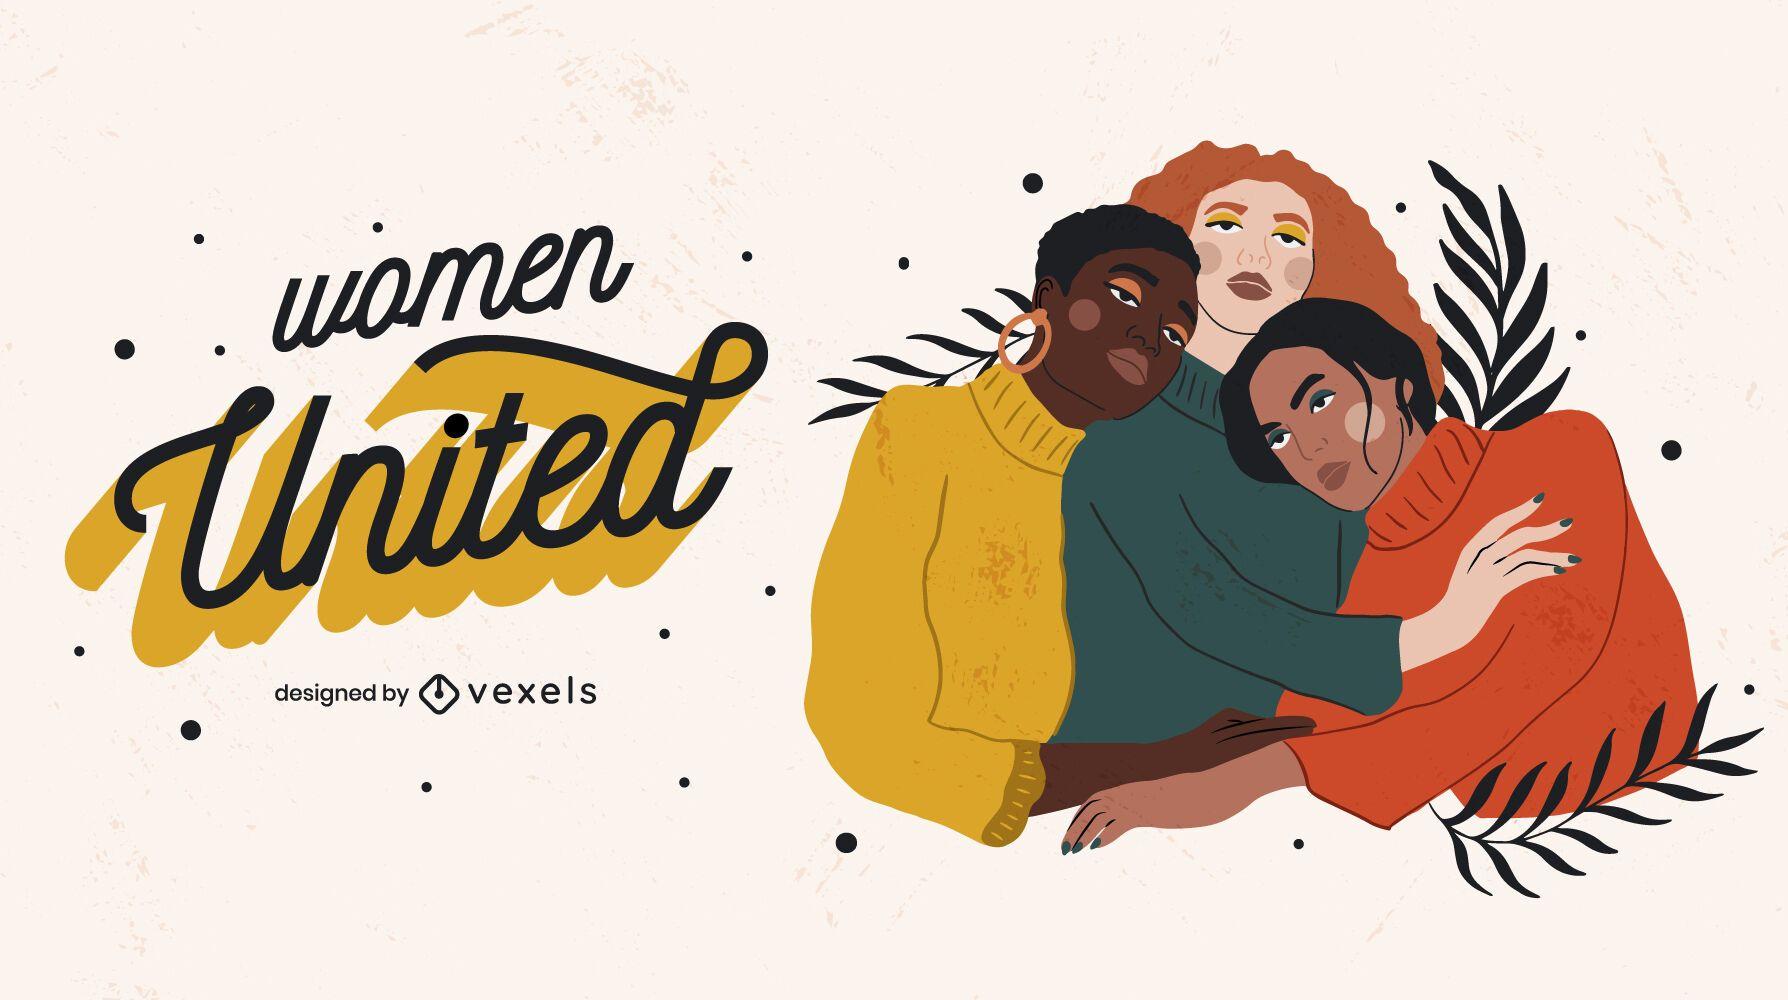 Women hugging illustration